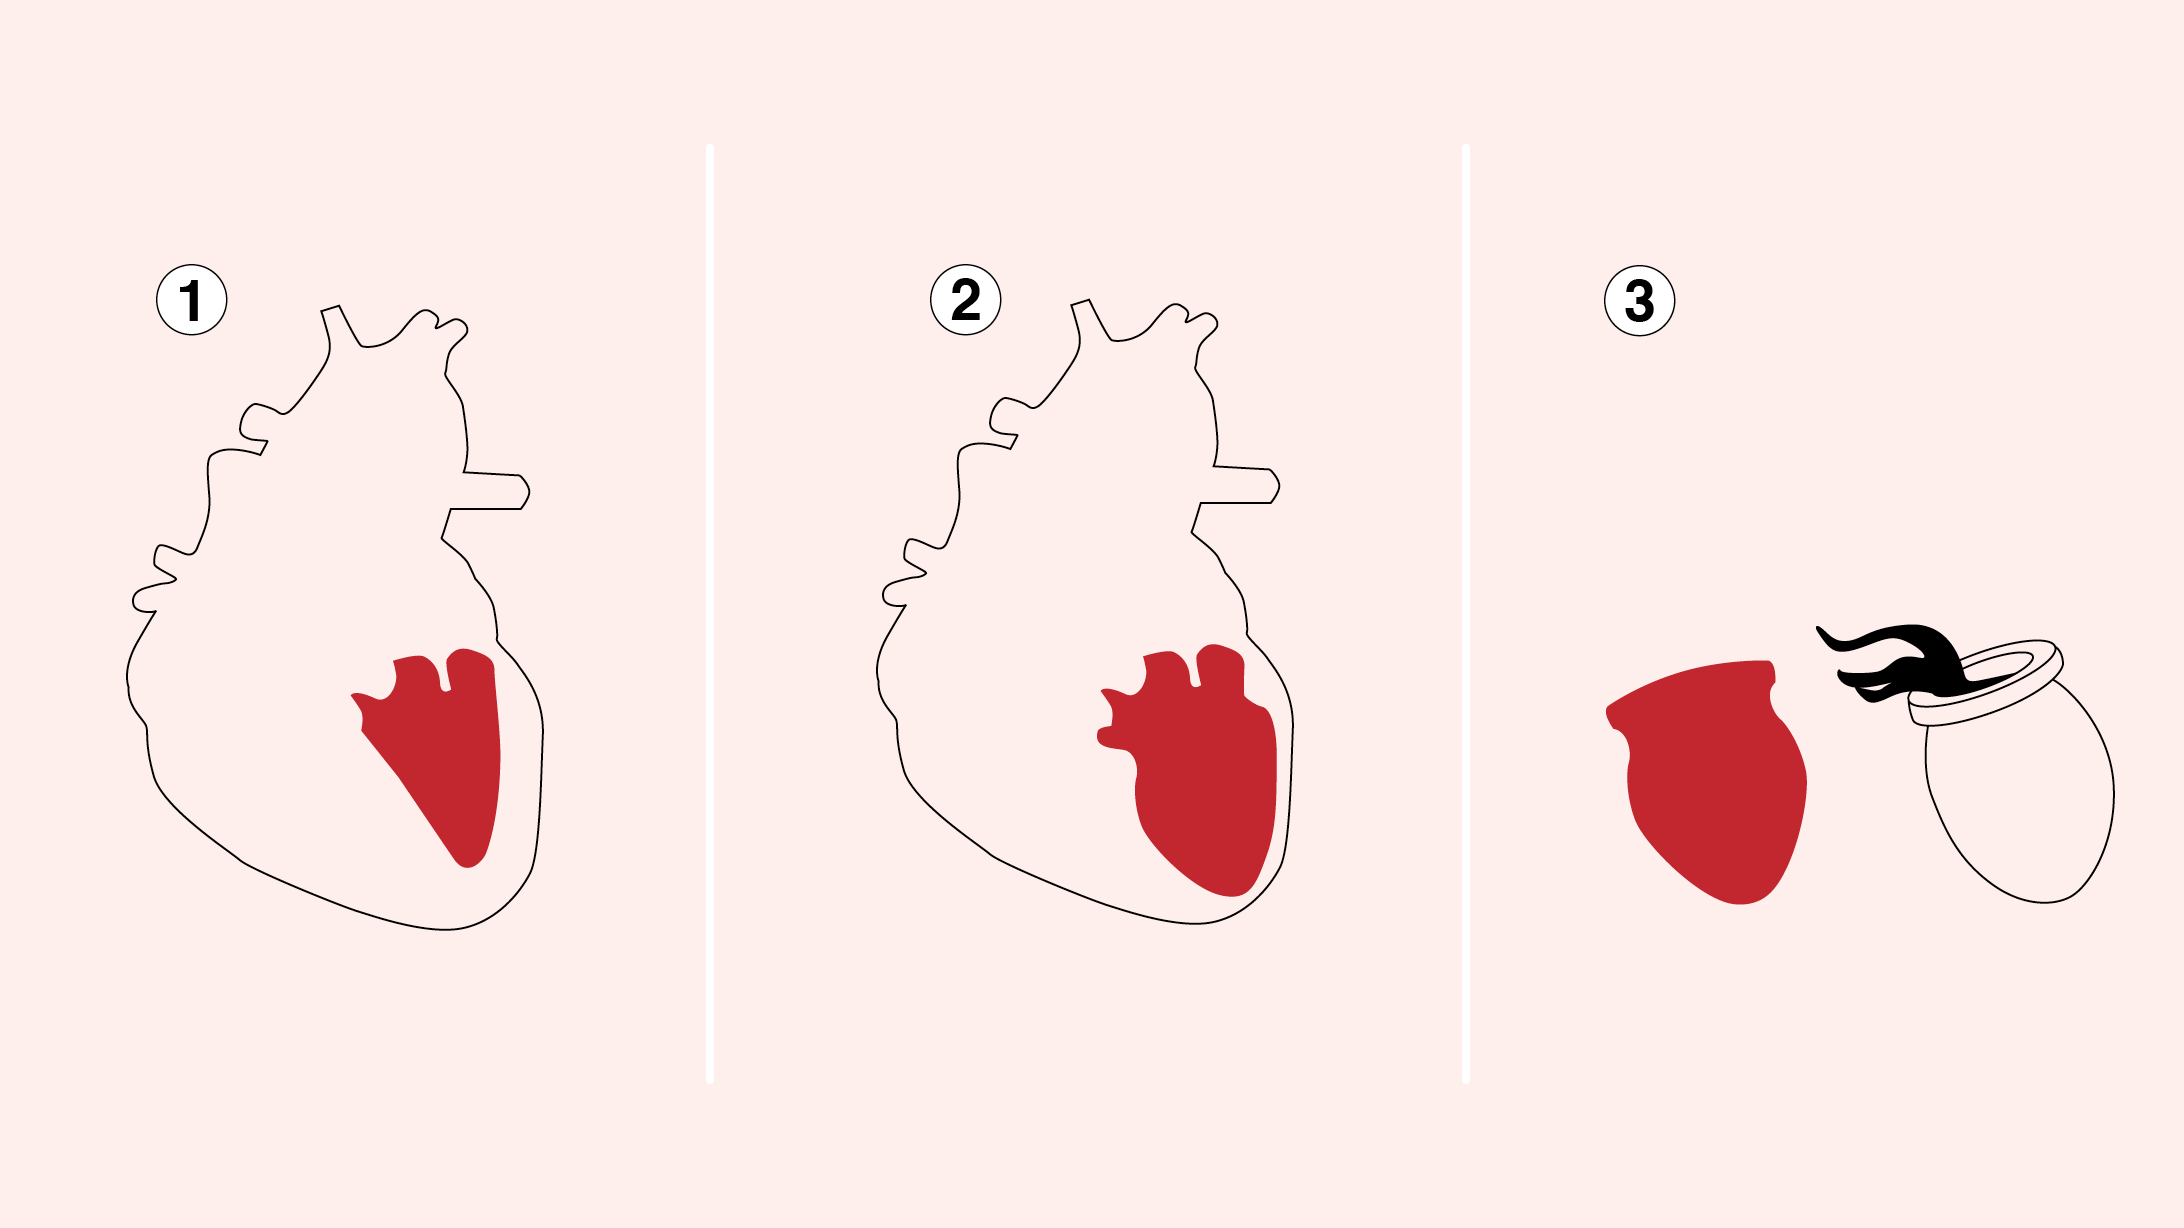 Herzinfarkt bei Frauen: Das Tako-Tsubo-Syndrom